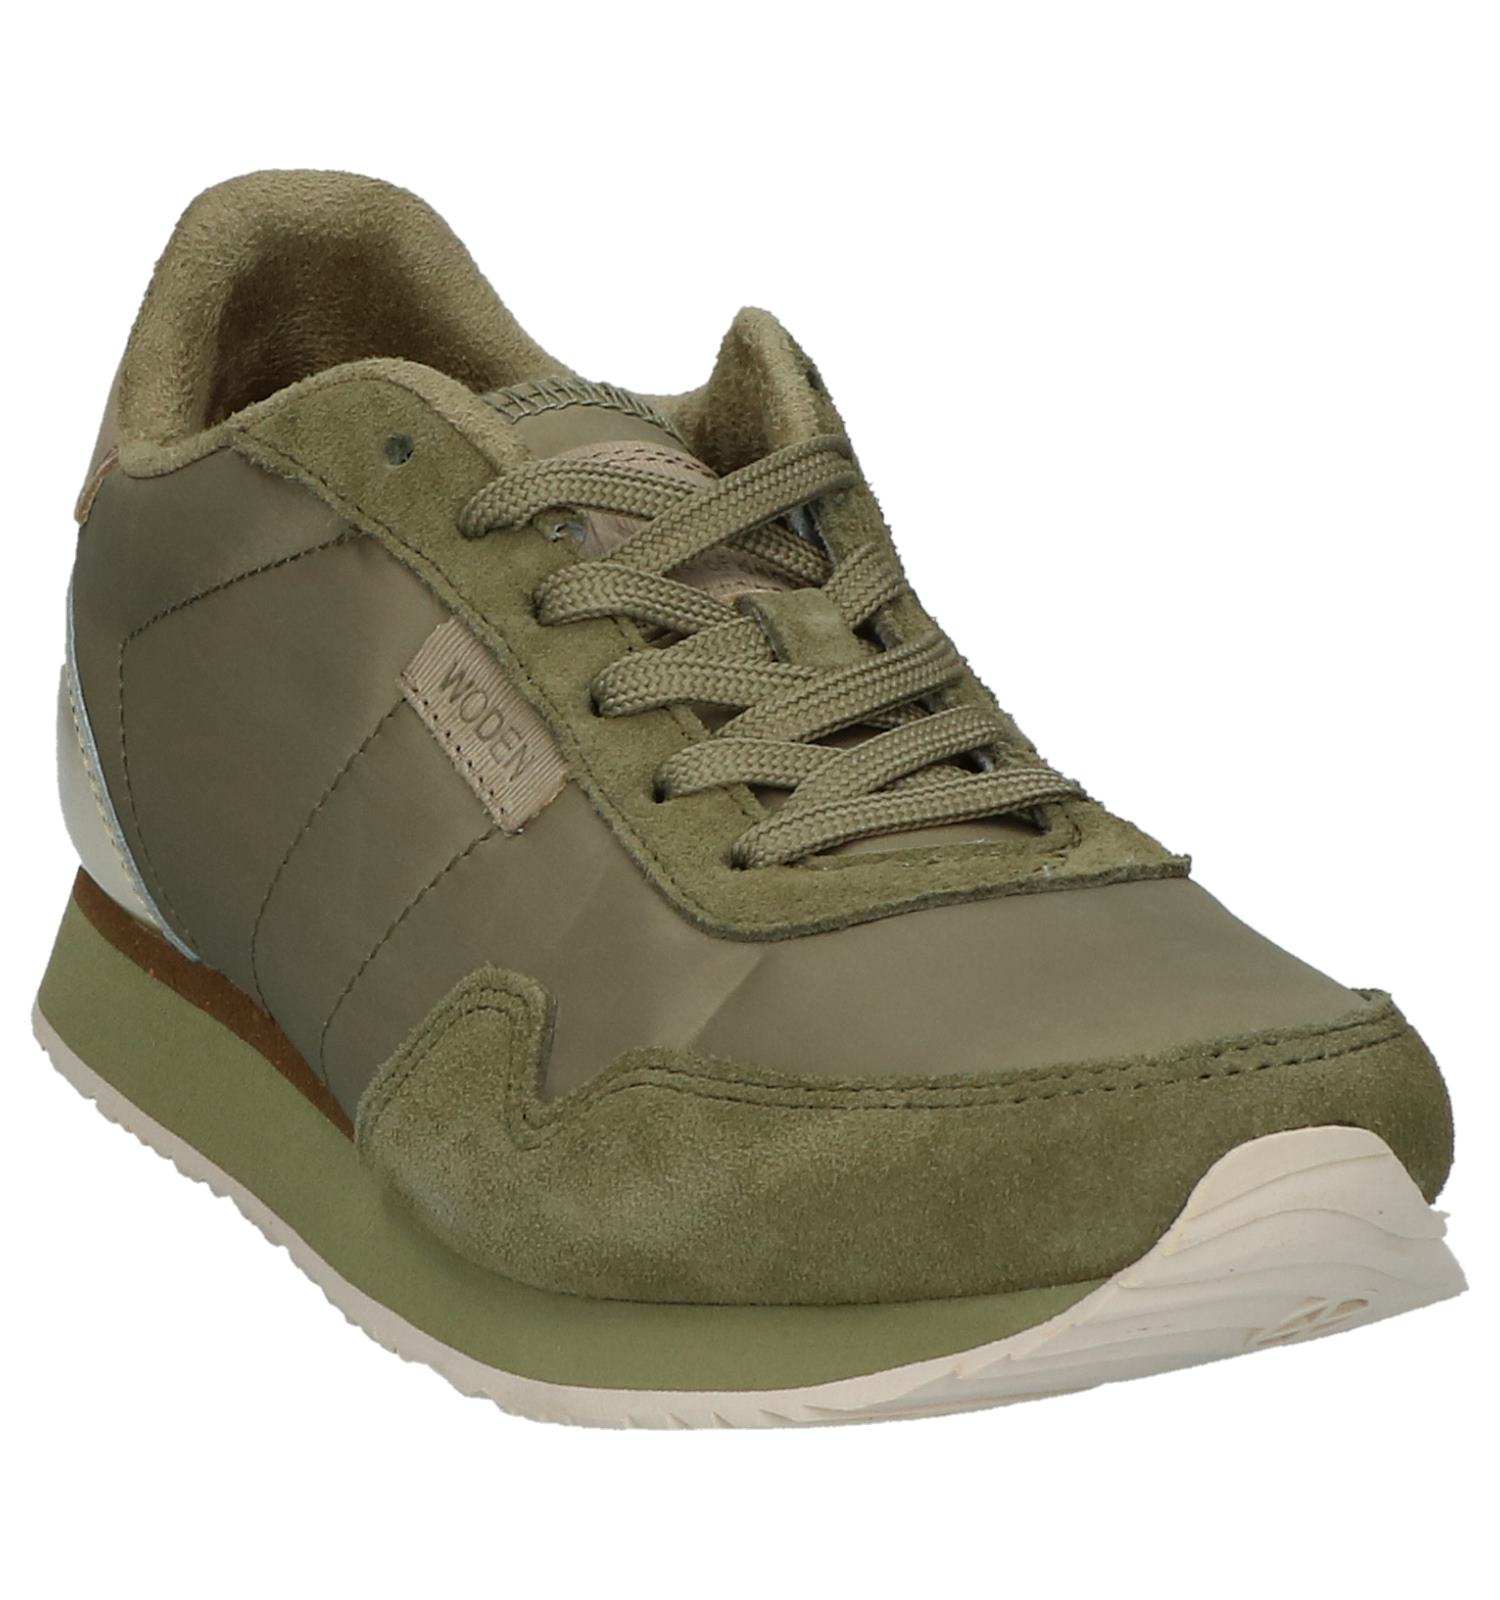 Ii Kaki Nora Woden Sneakers Kaki Woden qUMSzpGV